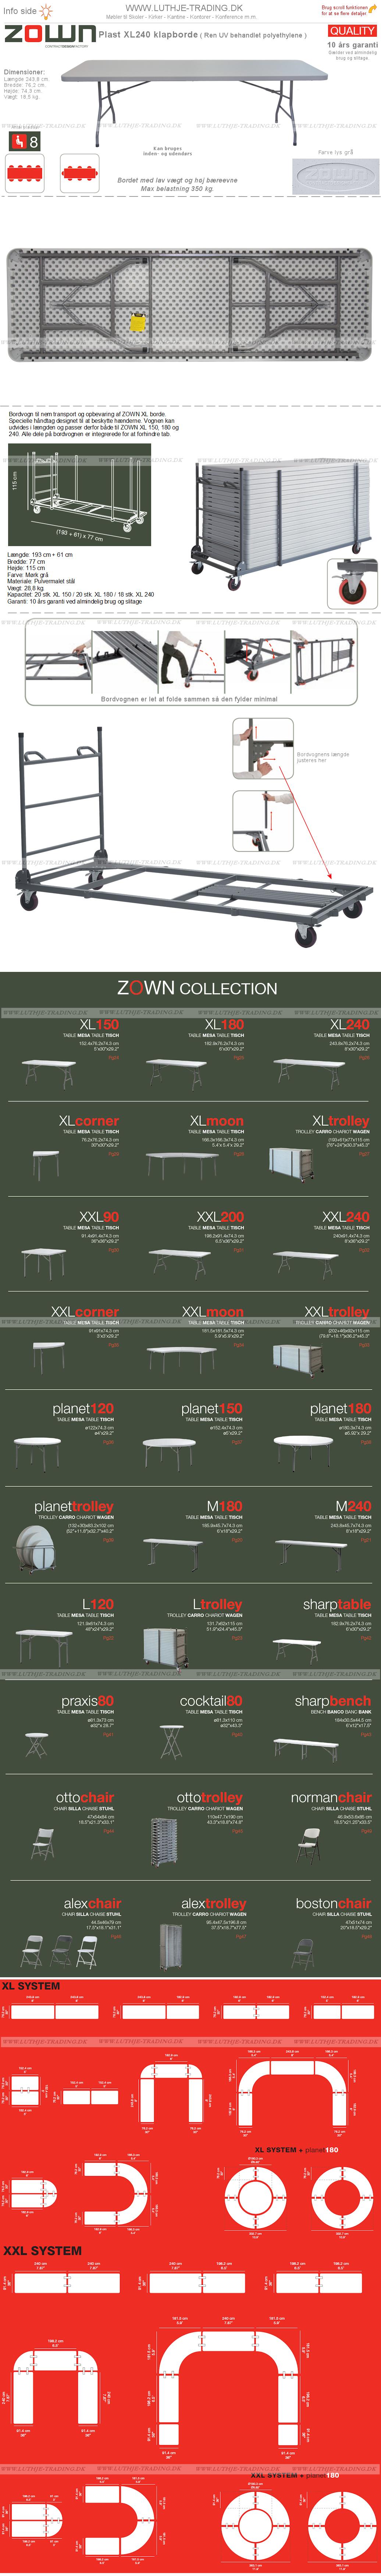 Zown XL240 plastborde